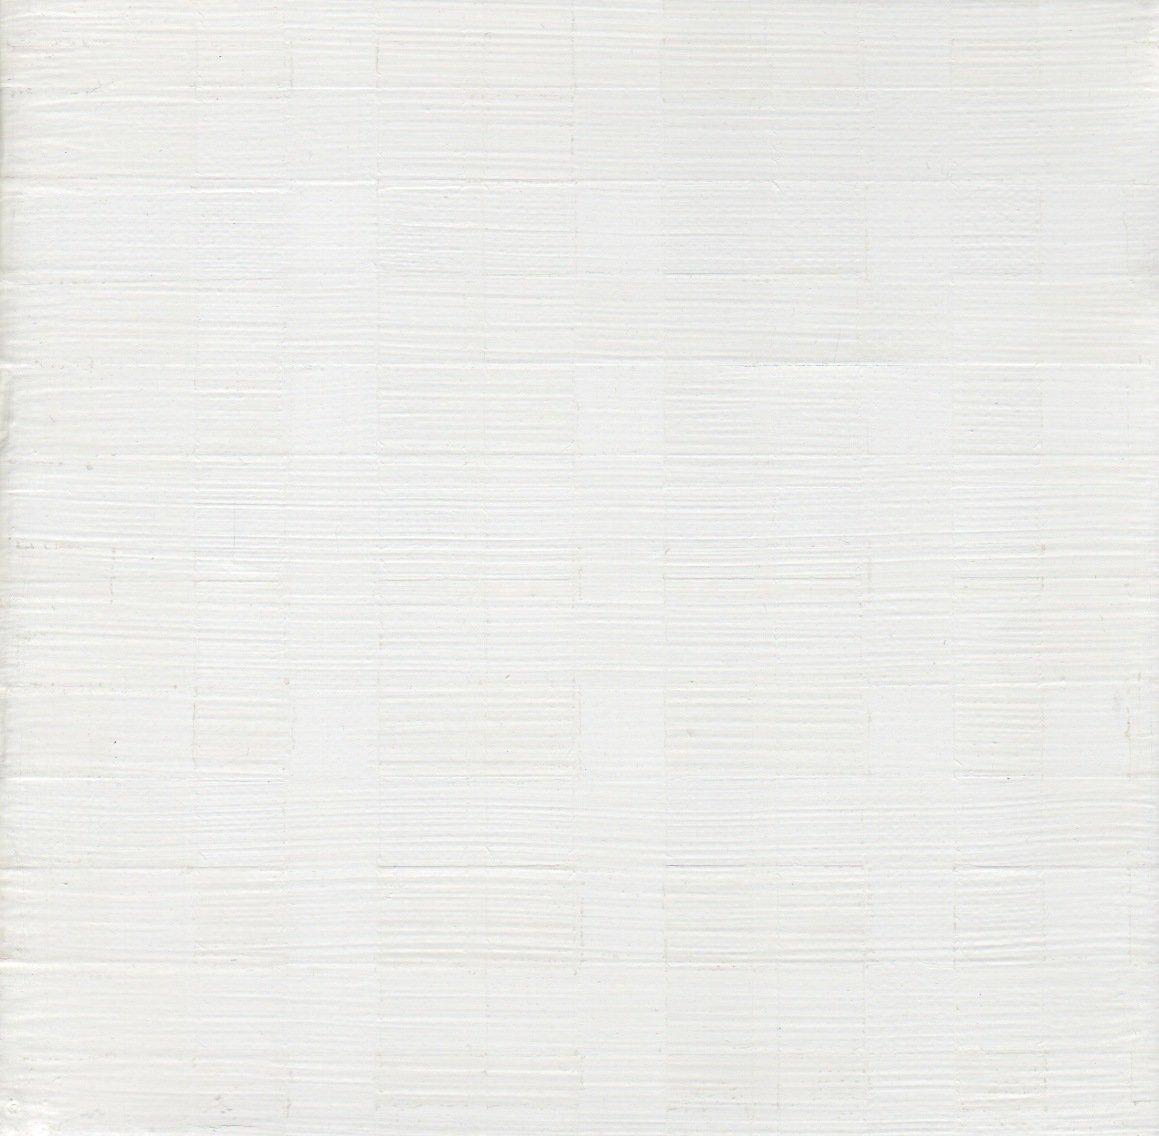 Polyphon/weiß/Polyphon/white 05 55_Polyphon/weiß/Polyphon/white 05